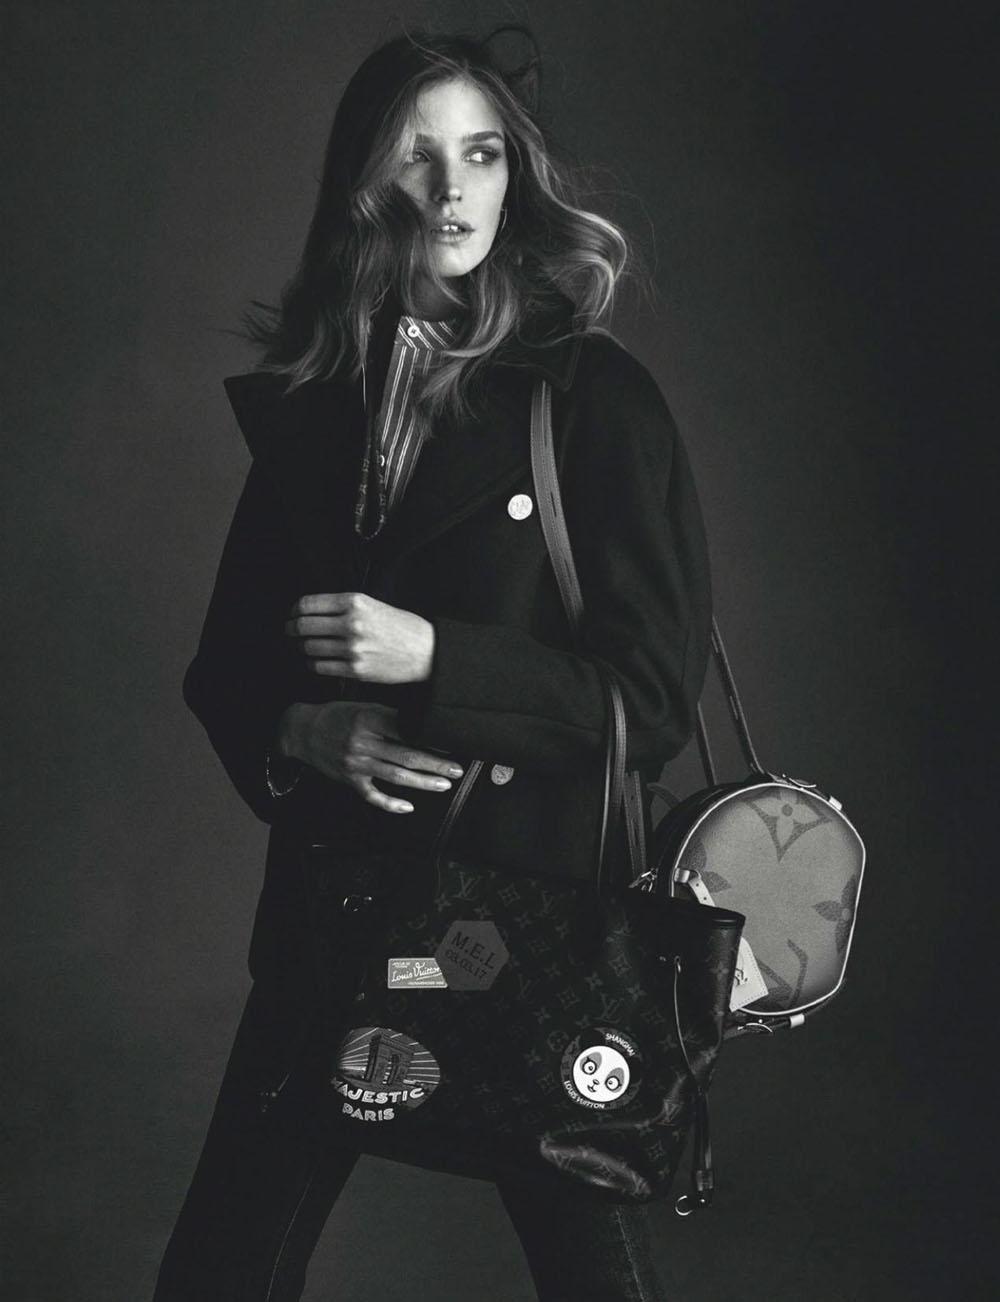 Alisa Ahmann by Andreas Sjodin for Elle Spain and Elle Netherlands July 2019